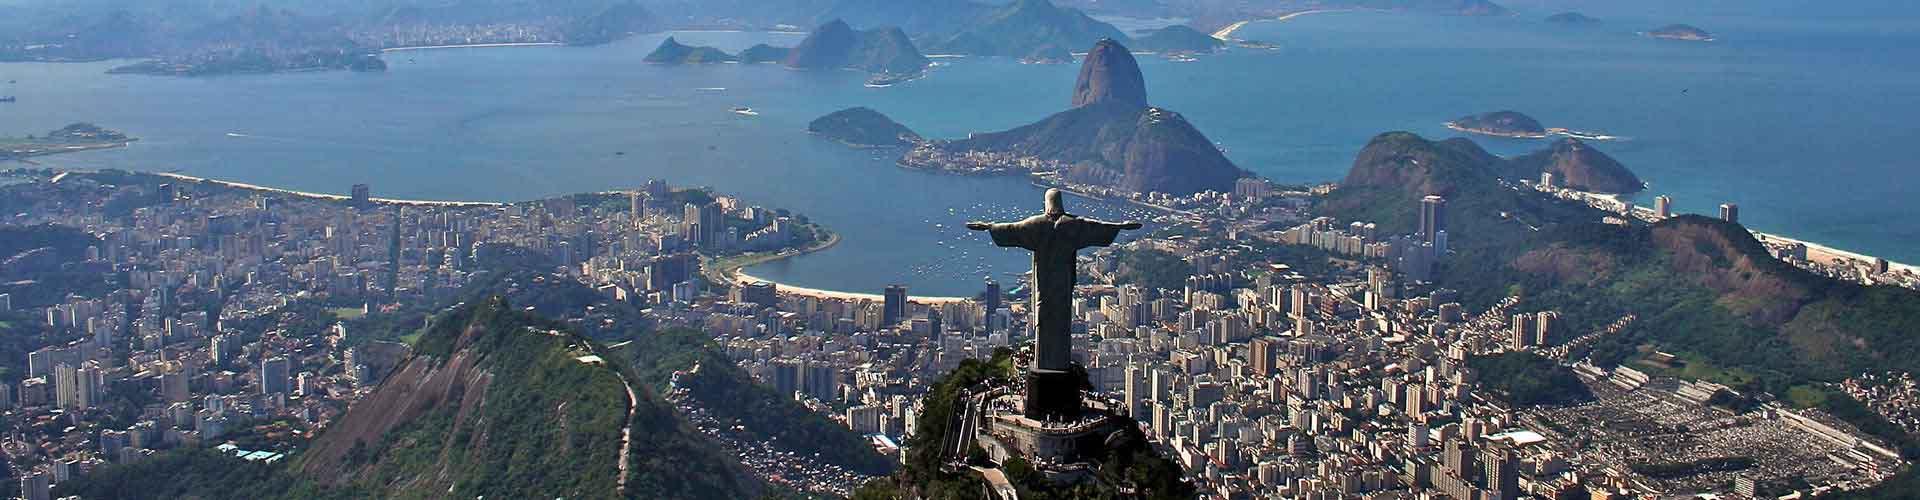 Rio de Janeiro - Hotel in Morro Dos Cabritos. Karten für Rio de Janeiro. Fotos und Bewertungen für jedes Hotel in Rio de Janeiro.